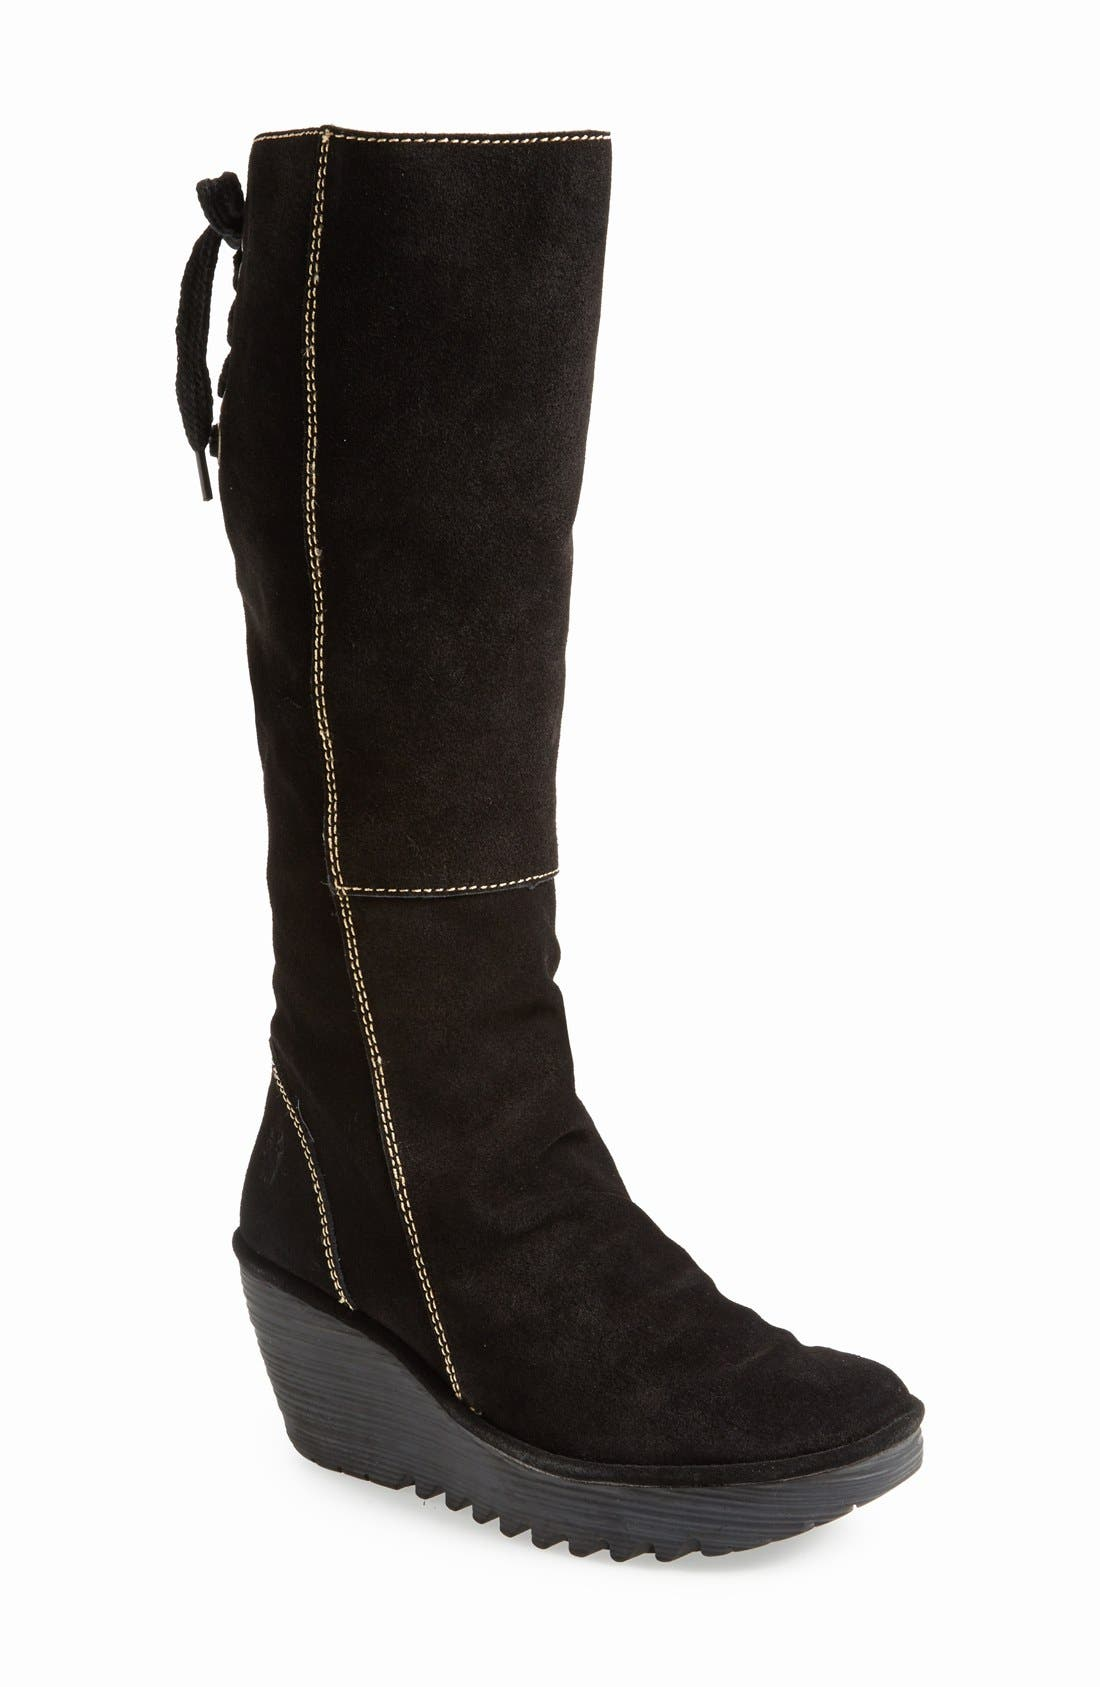 'Yust' Knee High Platform Wedge Boot,                         Main,                         color, Black Suede